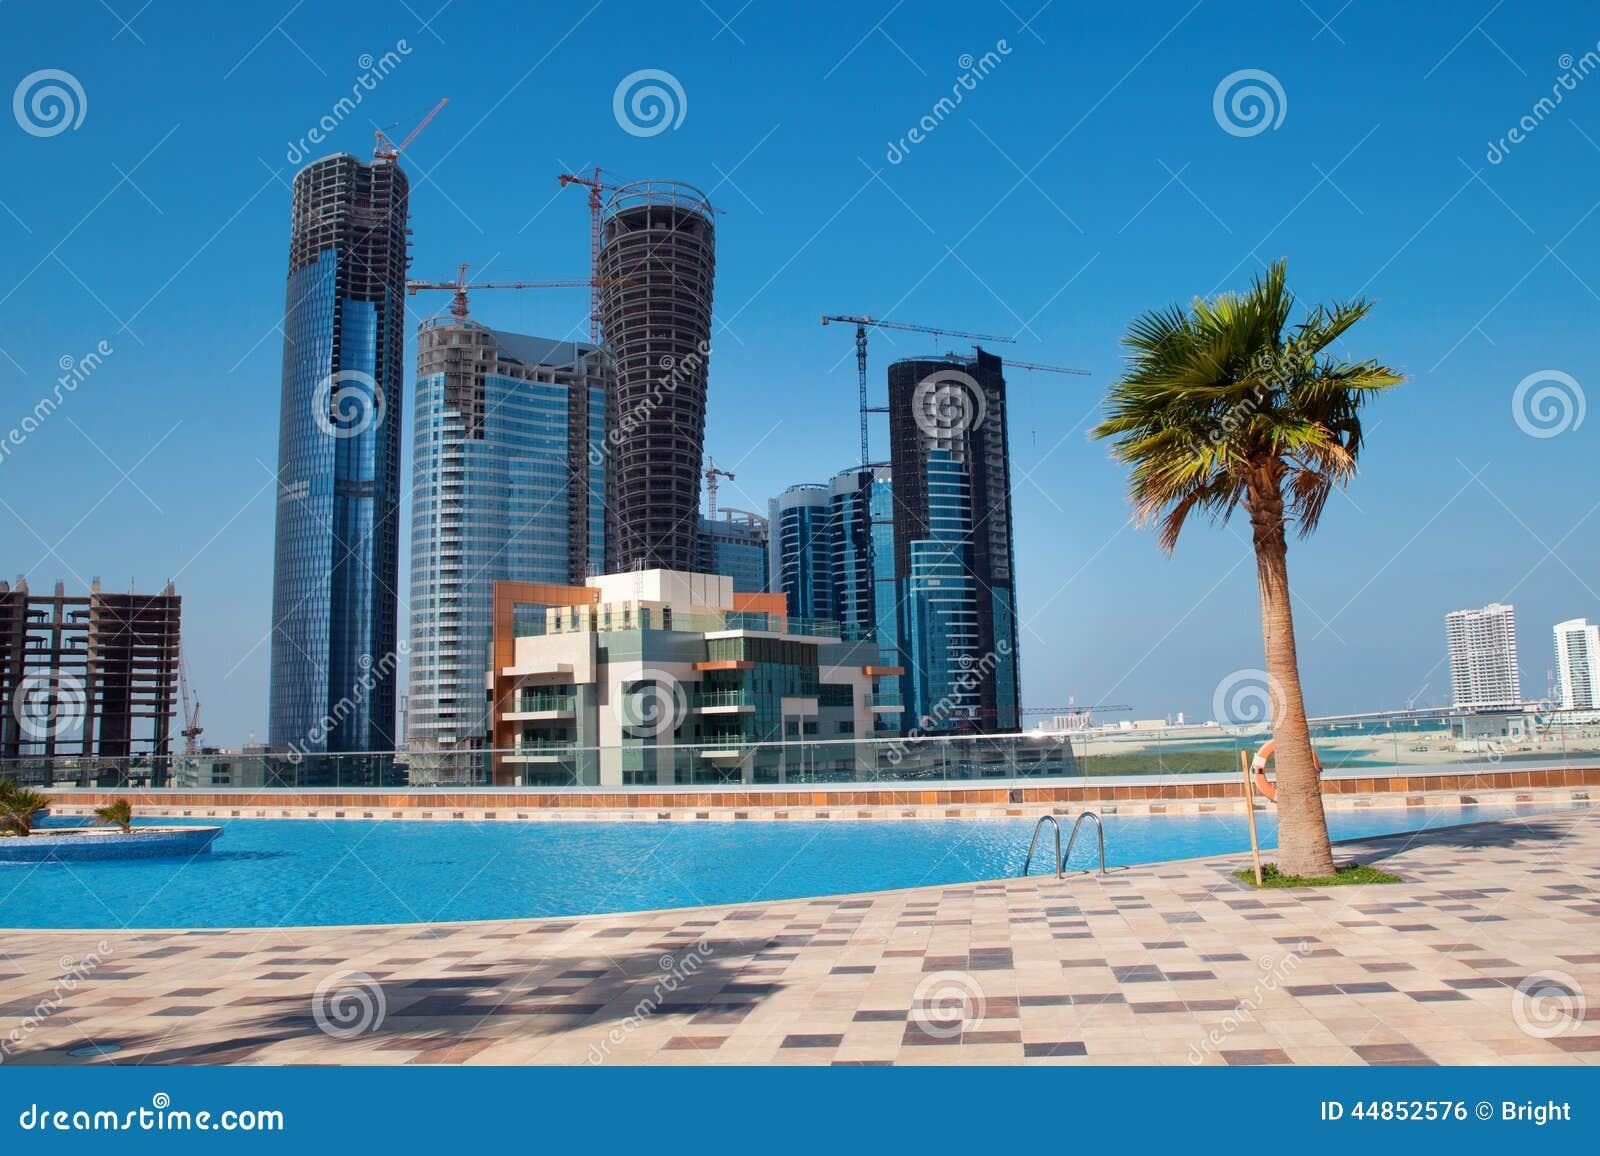 Nueva ciudad Abu Dhabi UAE